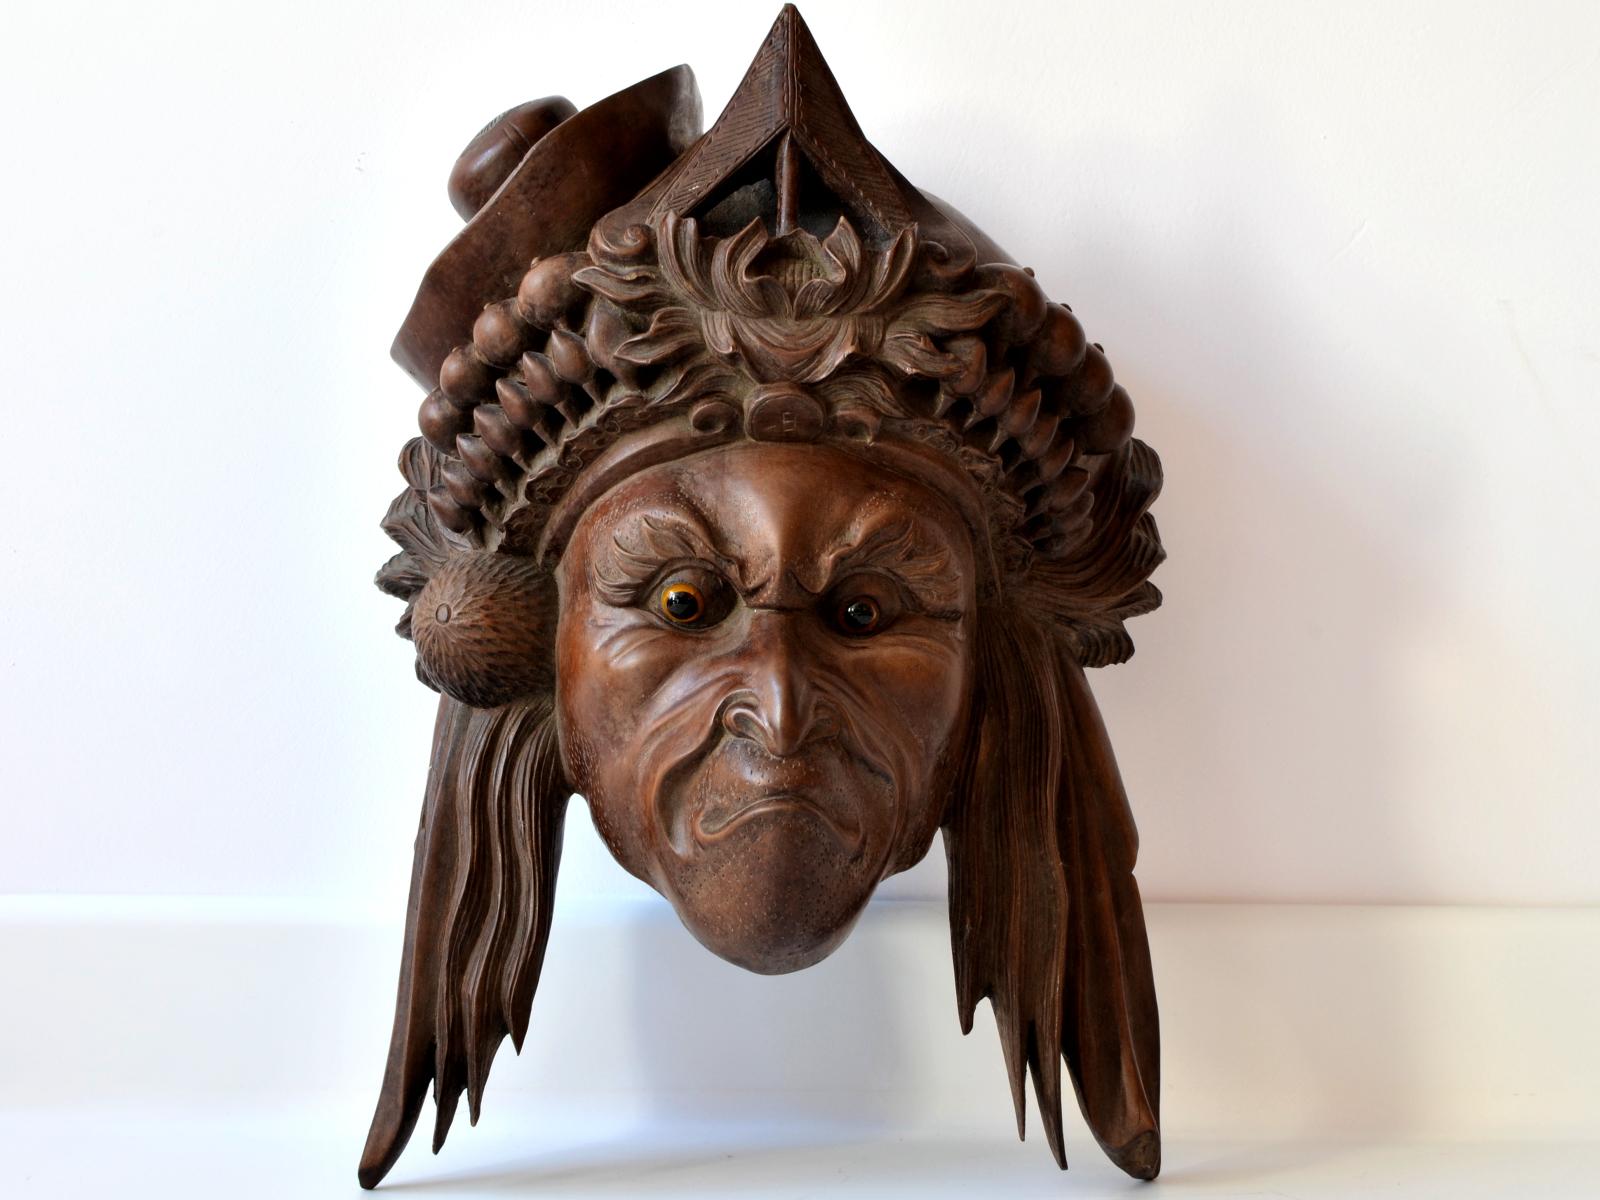 Masca chinezeasca din lemn exotic